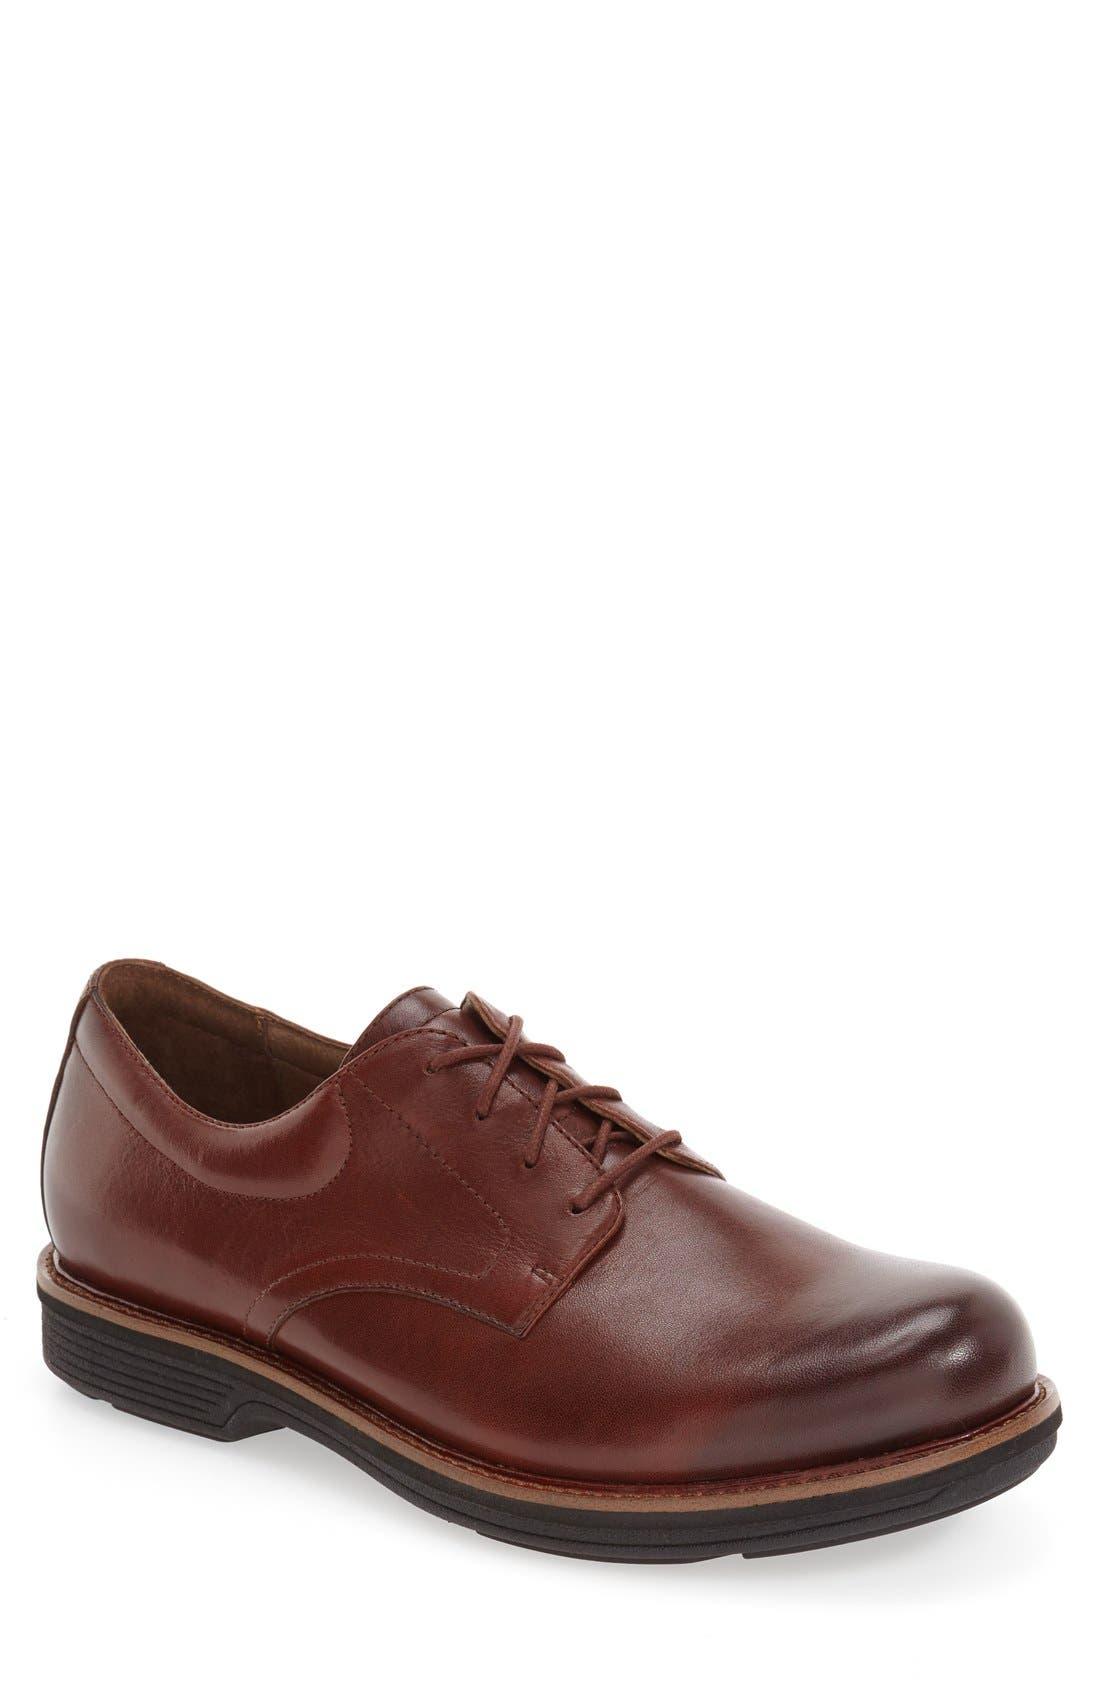 'Josh' Plain Toe Derby,                             Main thumbnail 1, color,                             Mahogany Antiqued Calf Leather